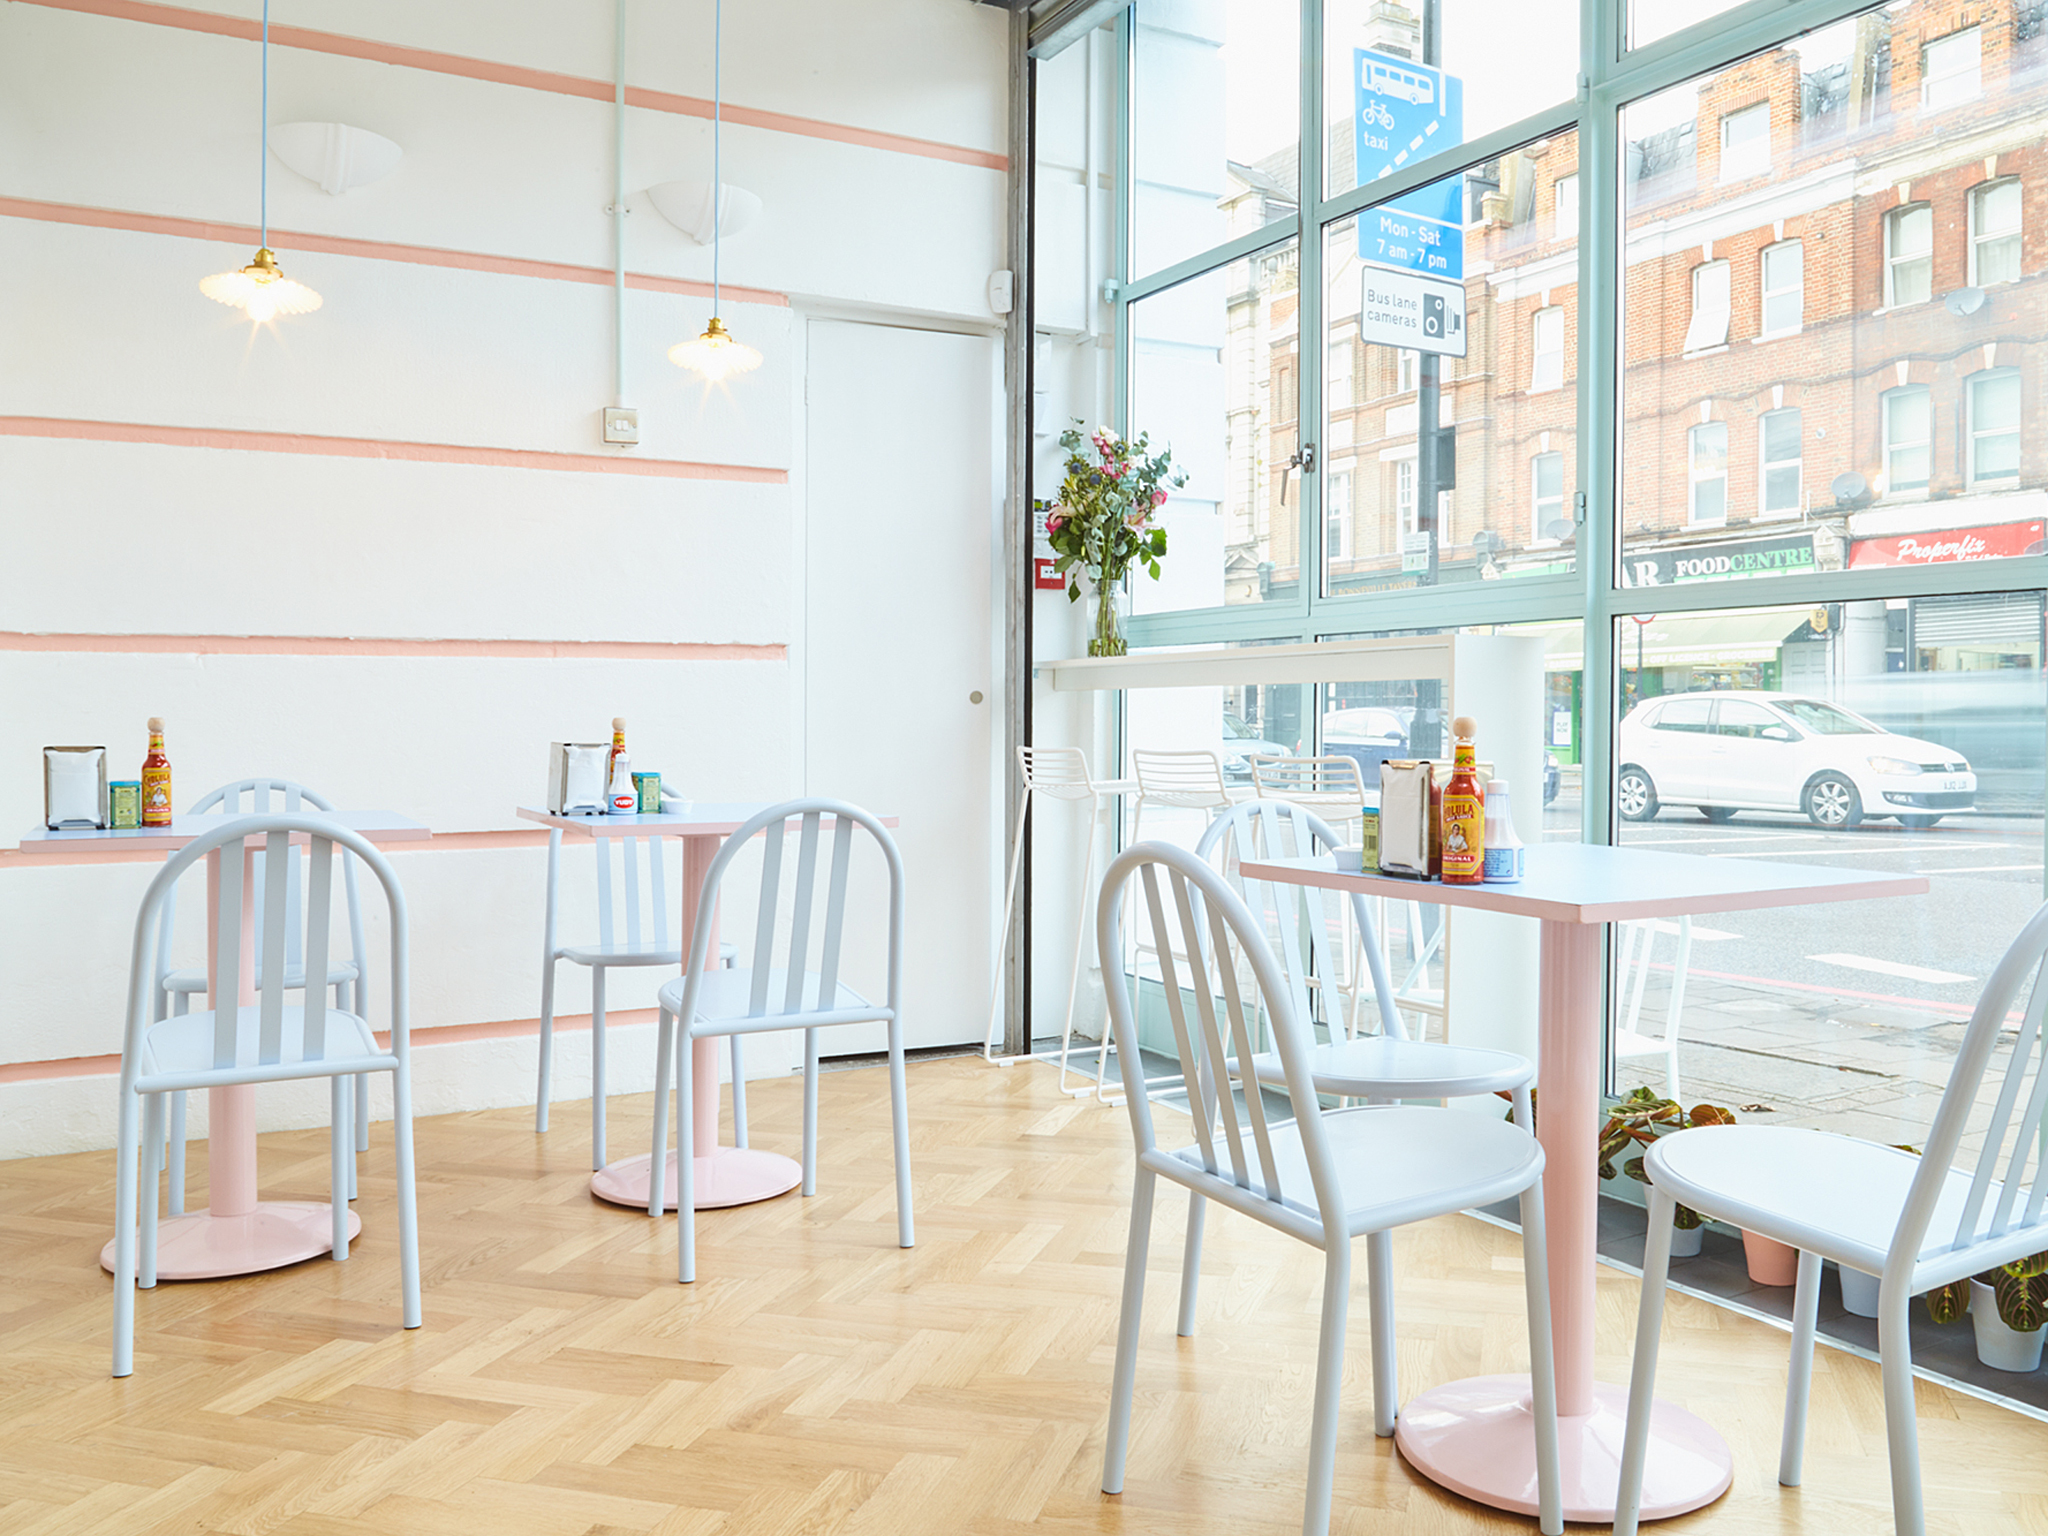 Café Miami Restaurants In Clapton London